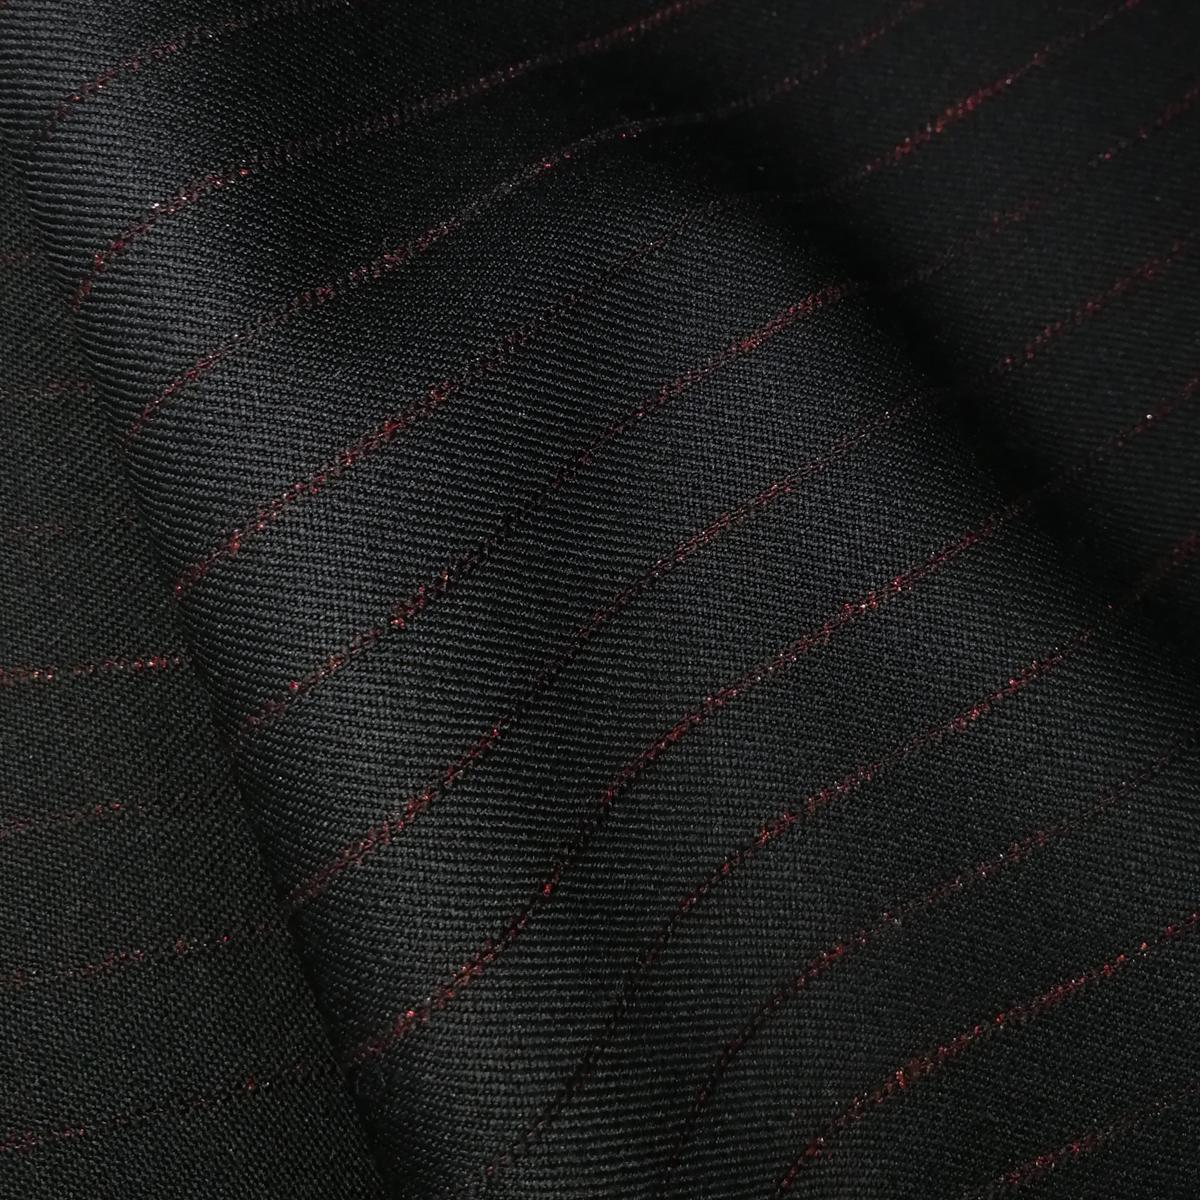 Шерстяная костюмная ткань в мерцающую полоску